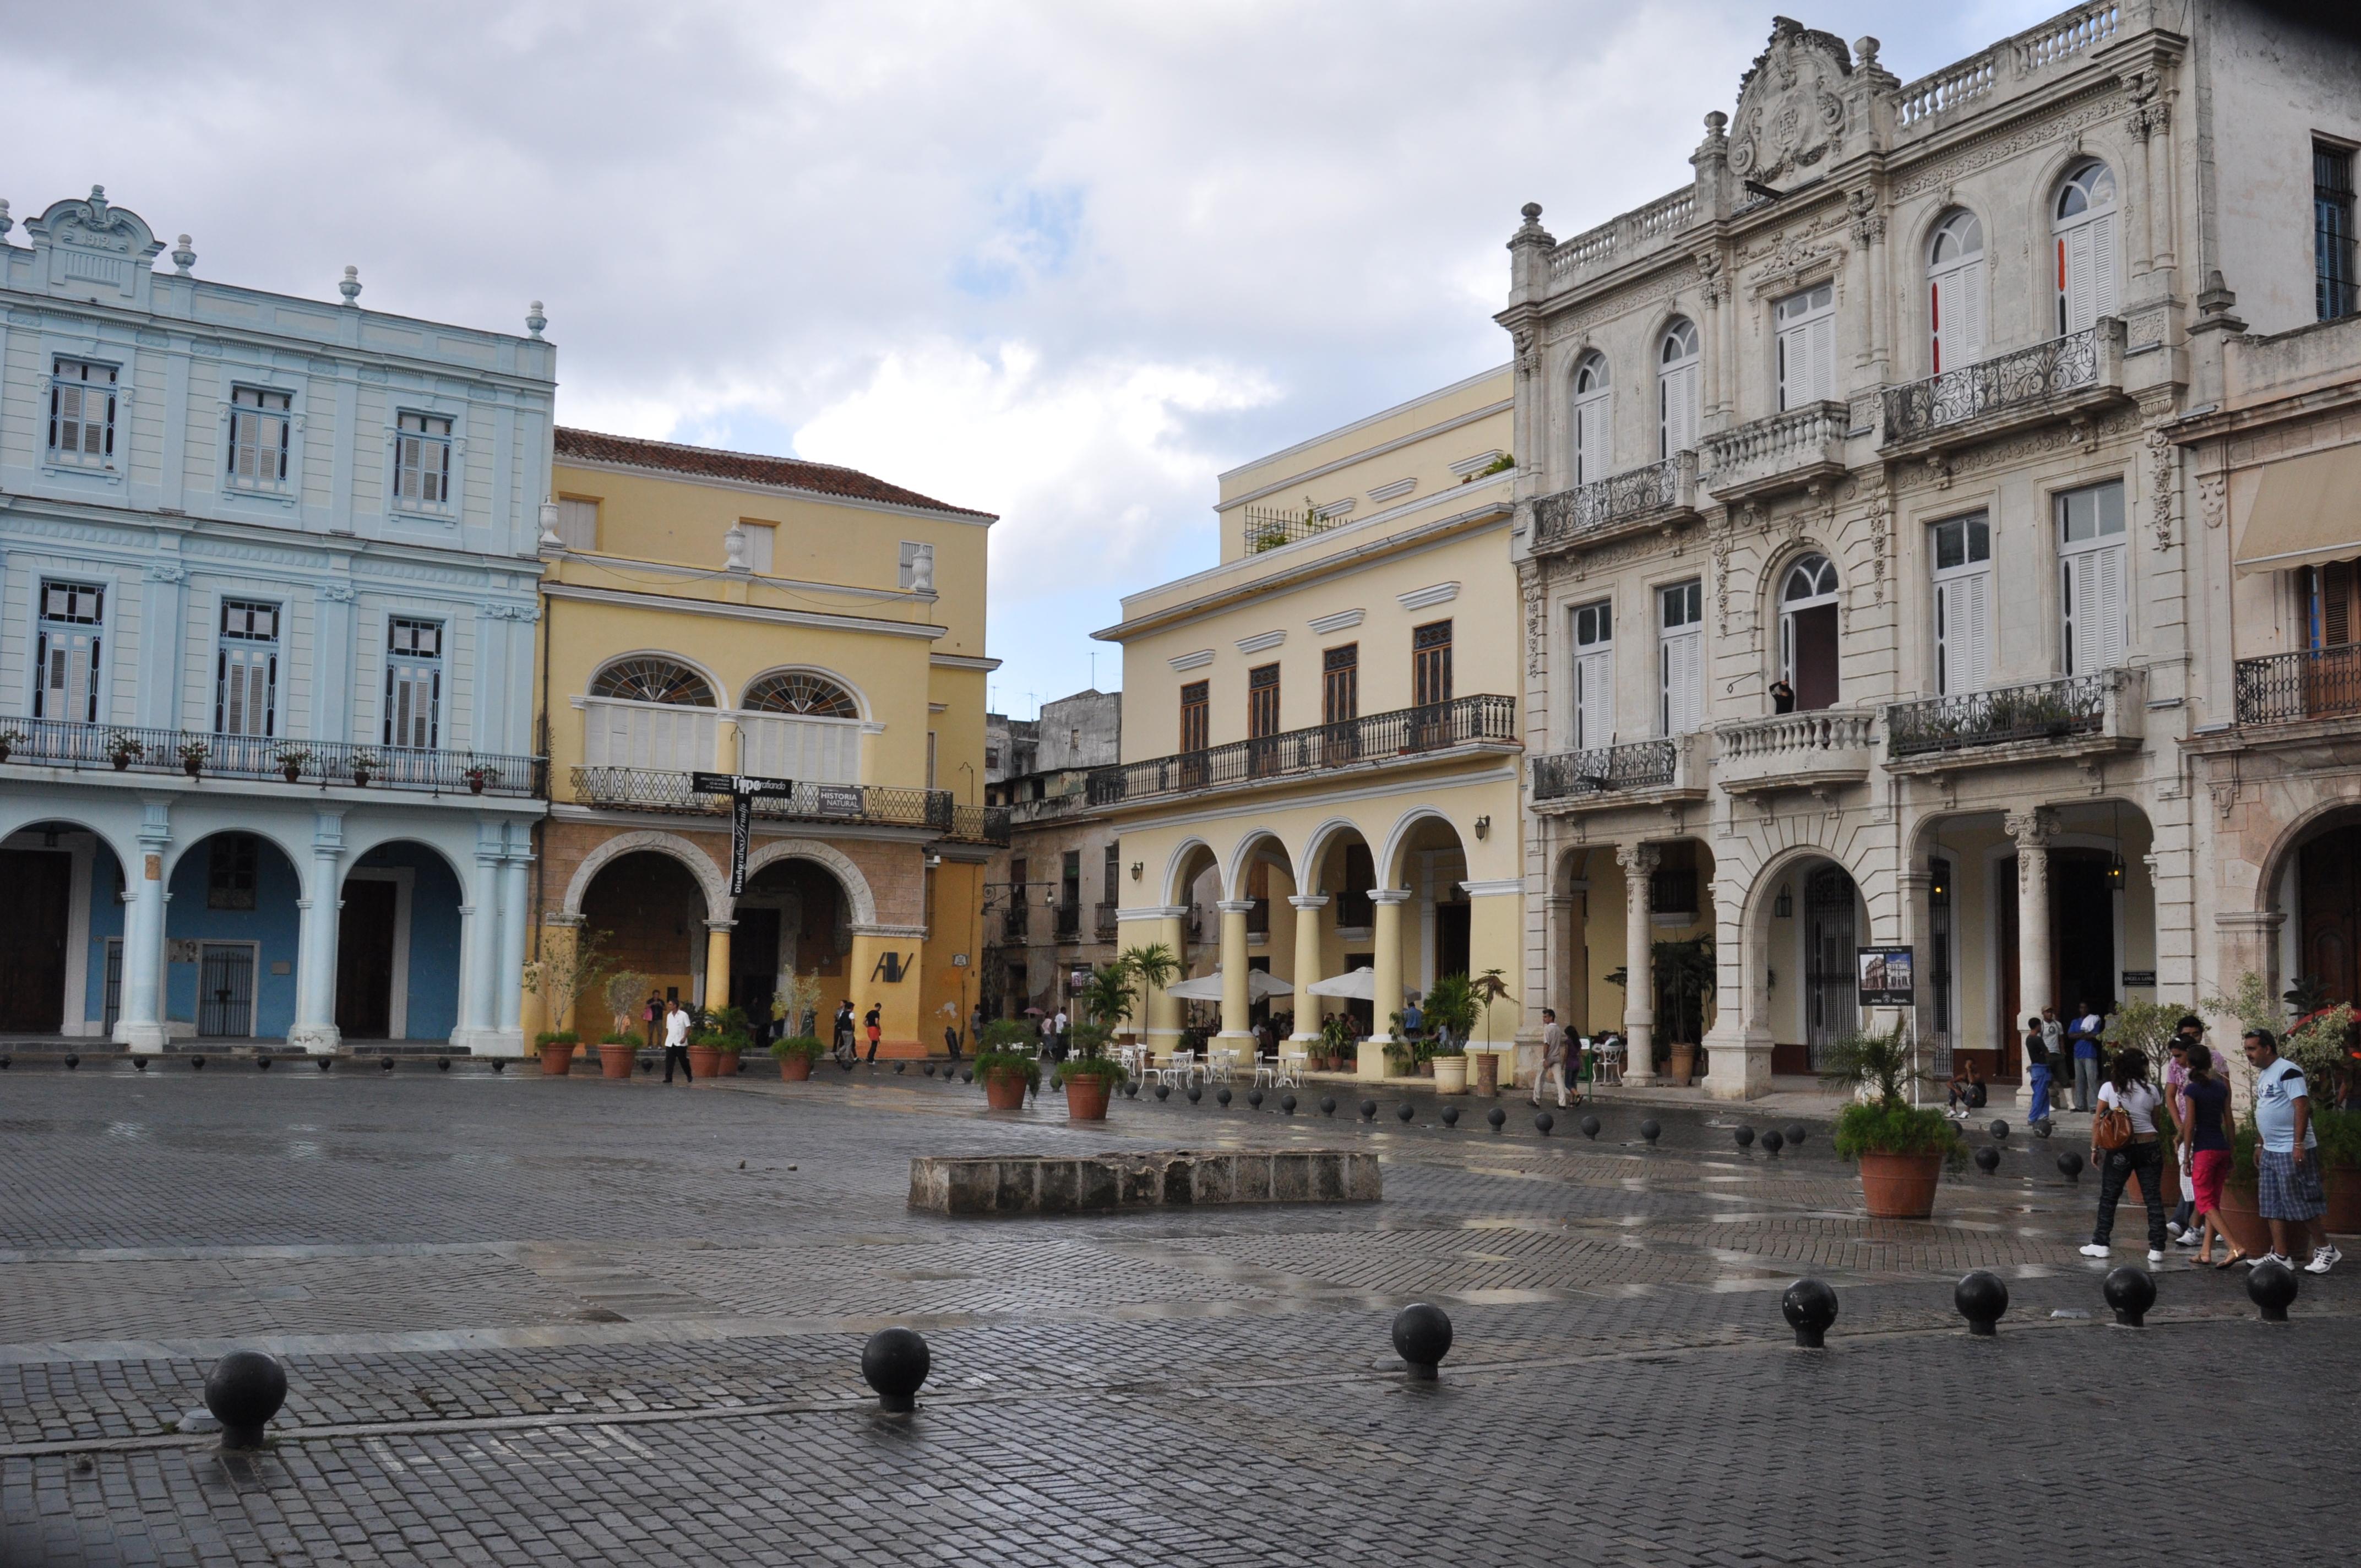 File:Habana Plaza Vieja.JPG - Wikimedia Commons